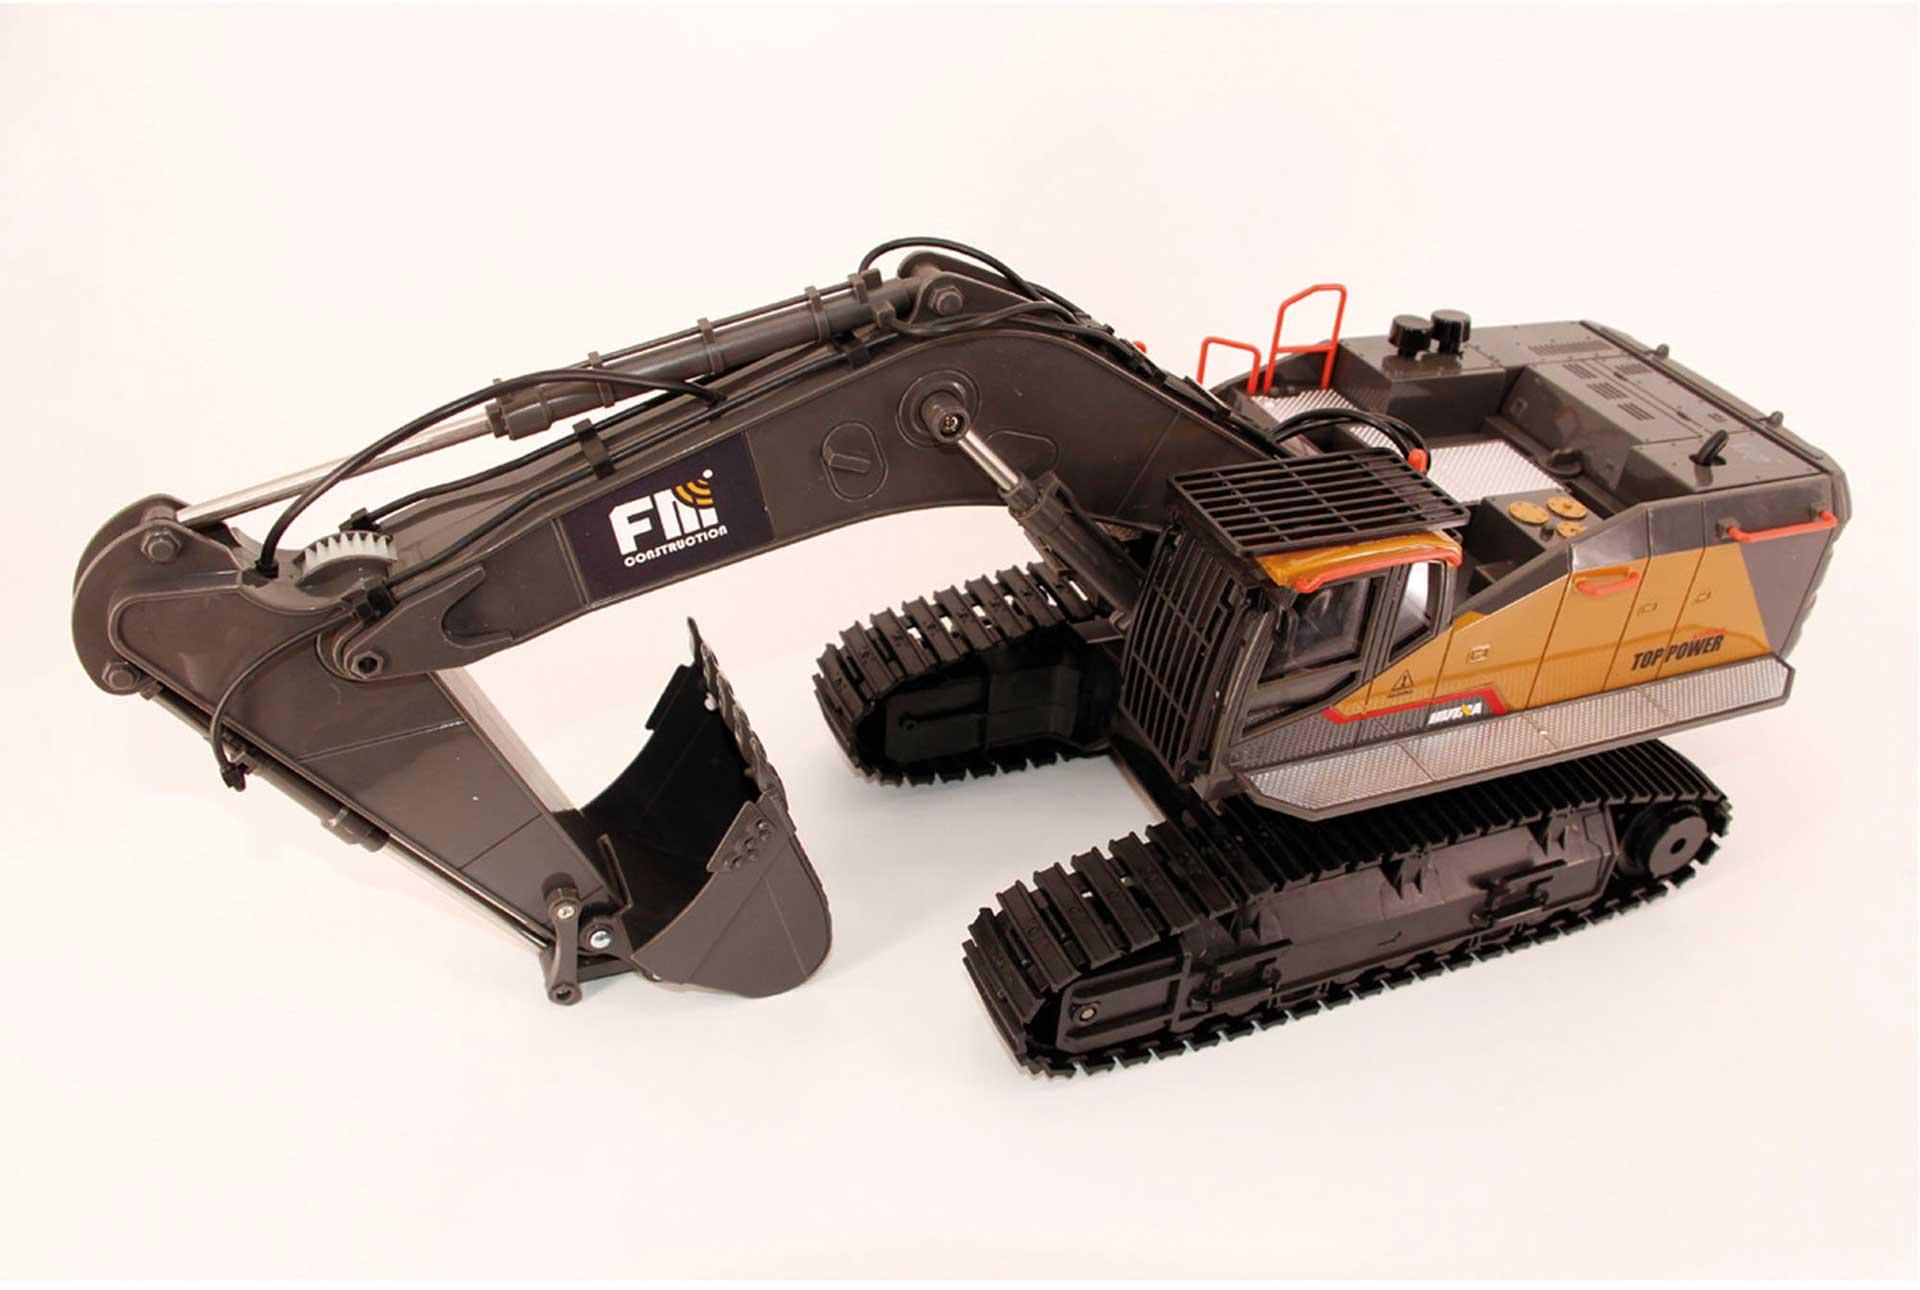 DIE-CAST CHAIN EXCAVATOR XL 1/14 2,4GHZ WITH METAL SHOVEL AND SOUND MODULE